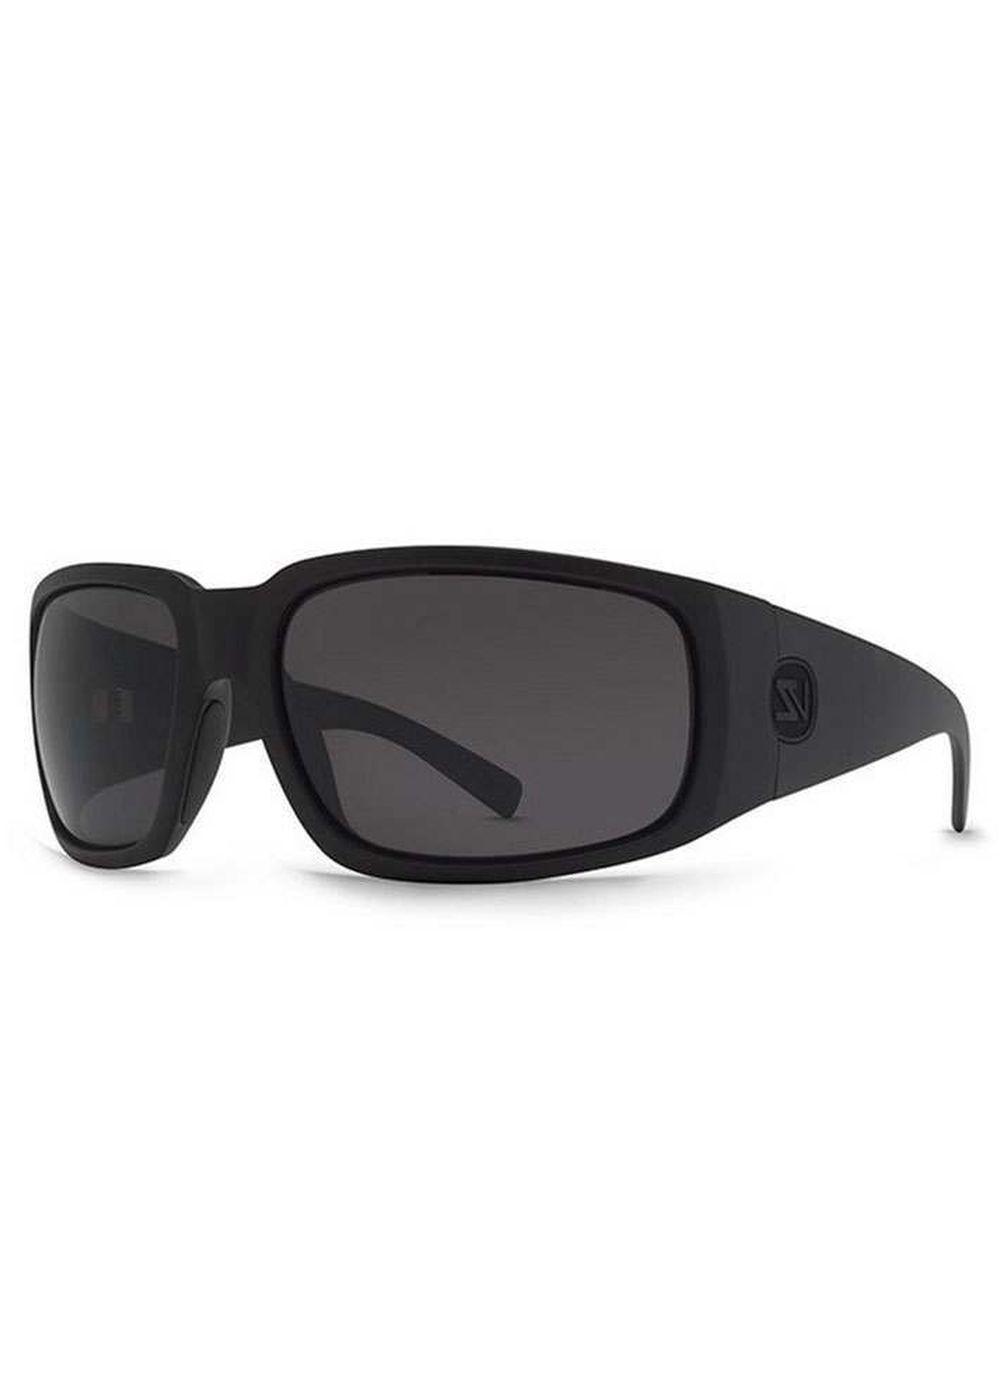 vonzipper-palooka-sunglasses-black-satingrey